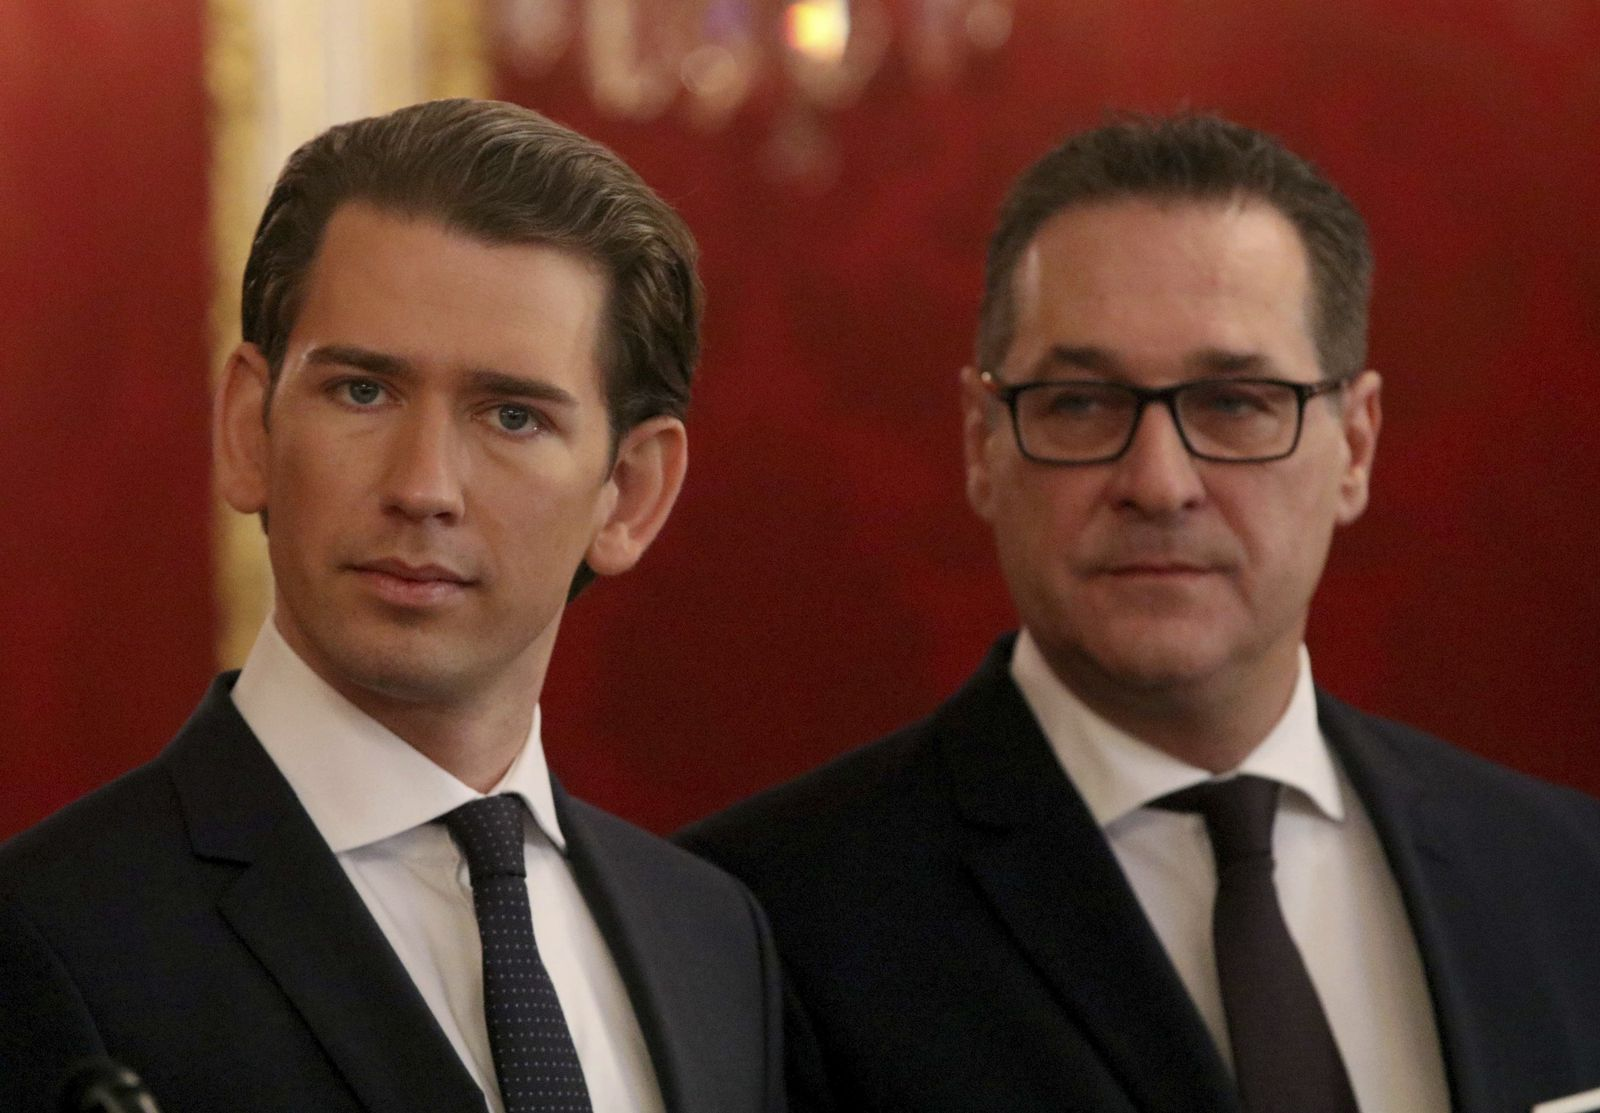 Sebastian Kurz / Heinz-Christian Strache